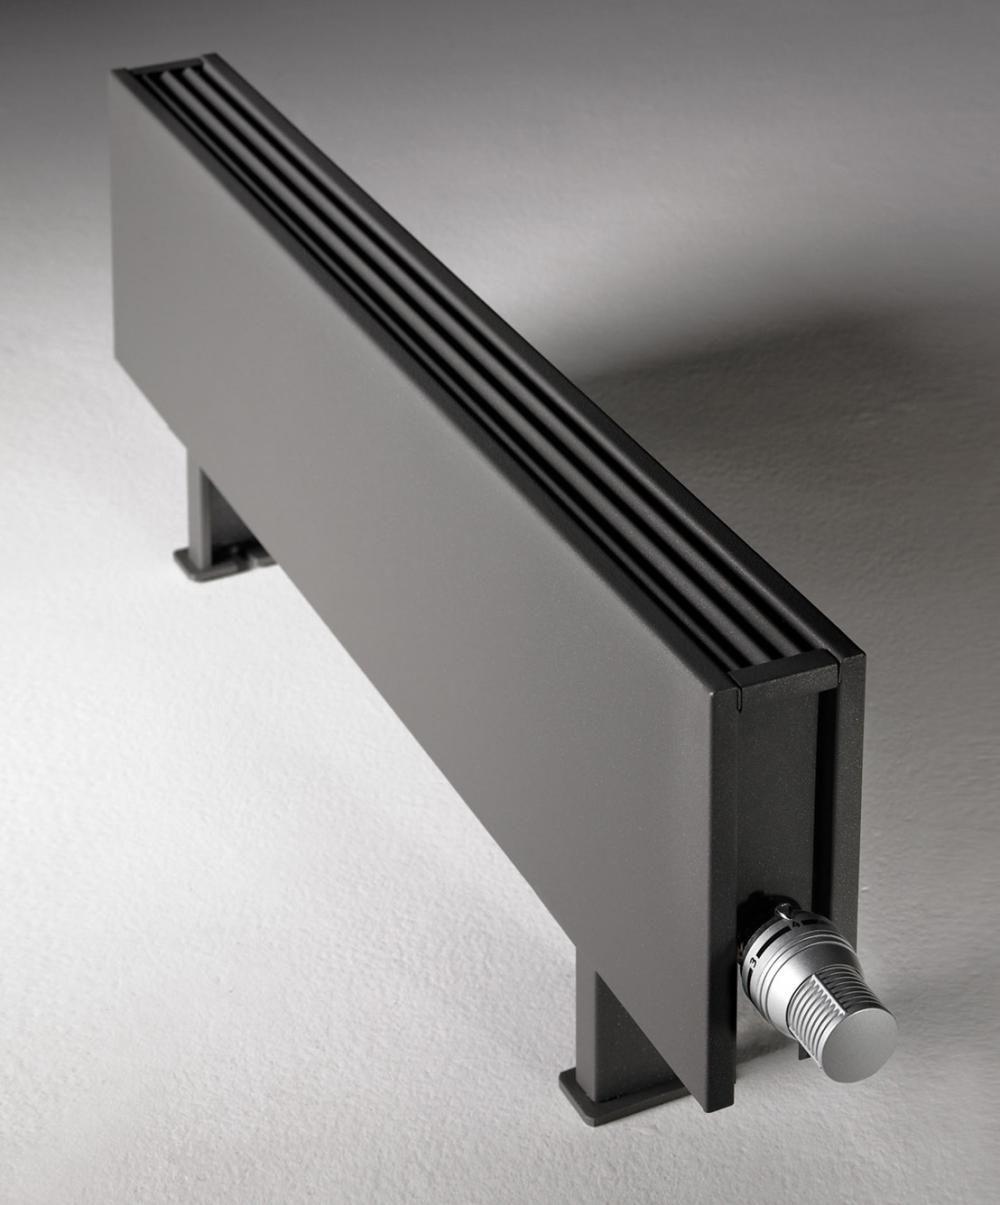 Calorifere Mini Freestanding 230x1800x80 mm, 970 W